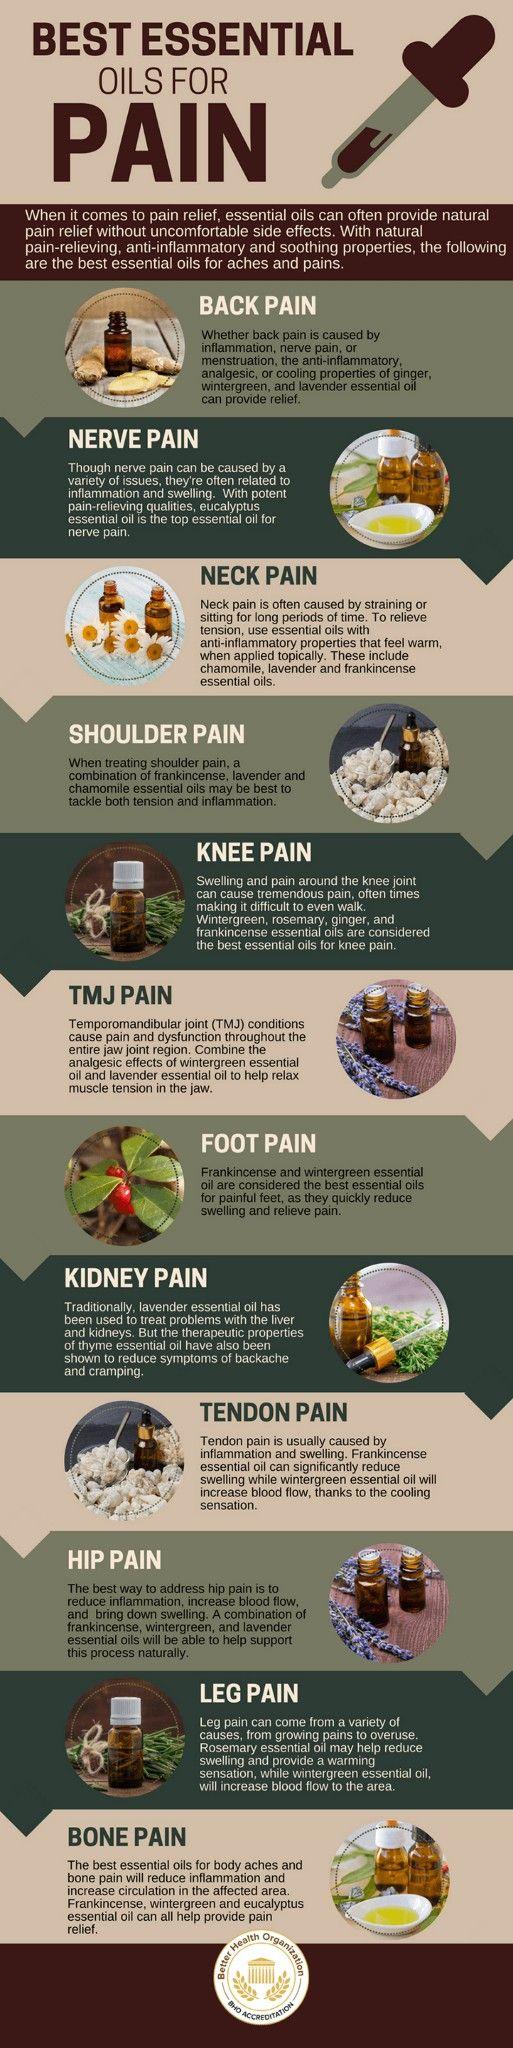 Best Essential Oils for Pain Management – Back, Nerve, Neck, Shoulder & Knee Essential Oils for Pain